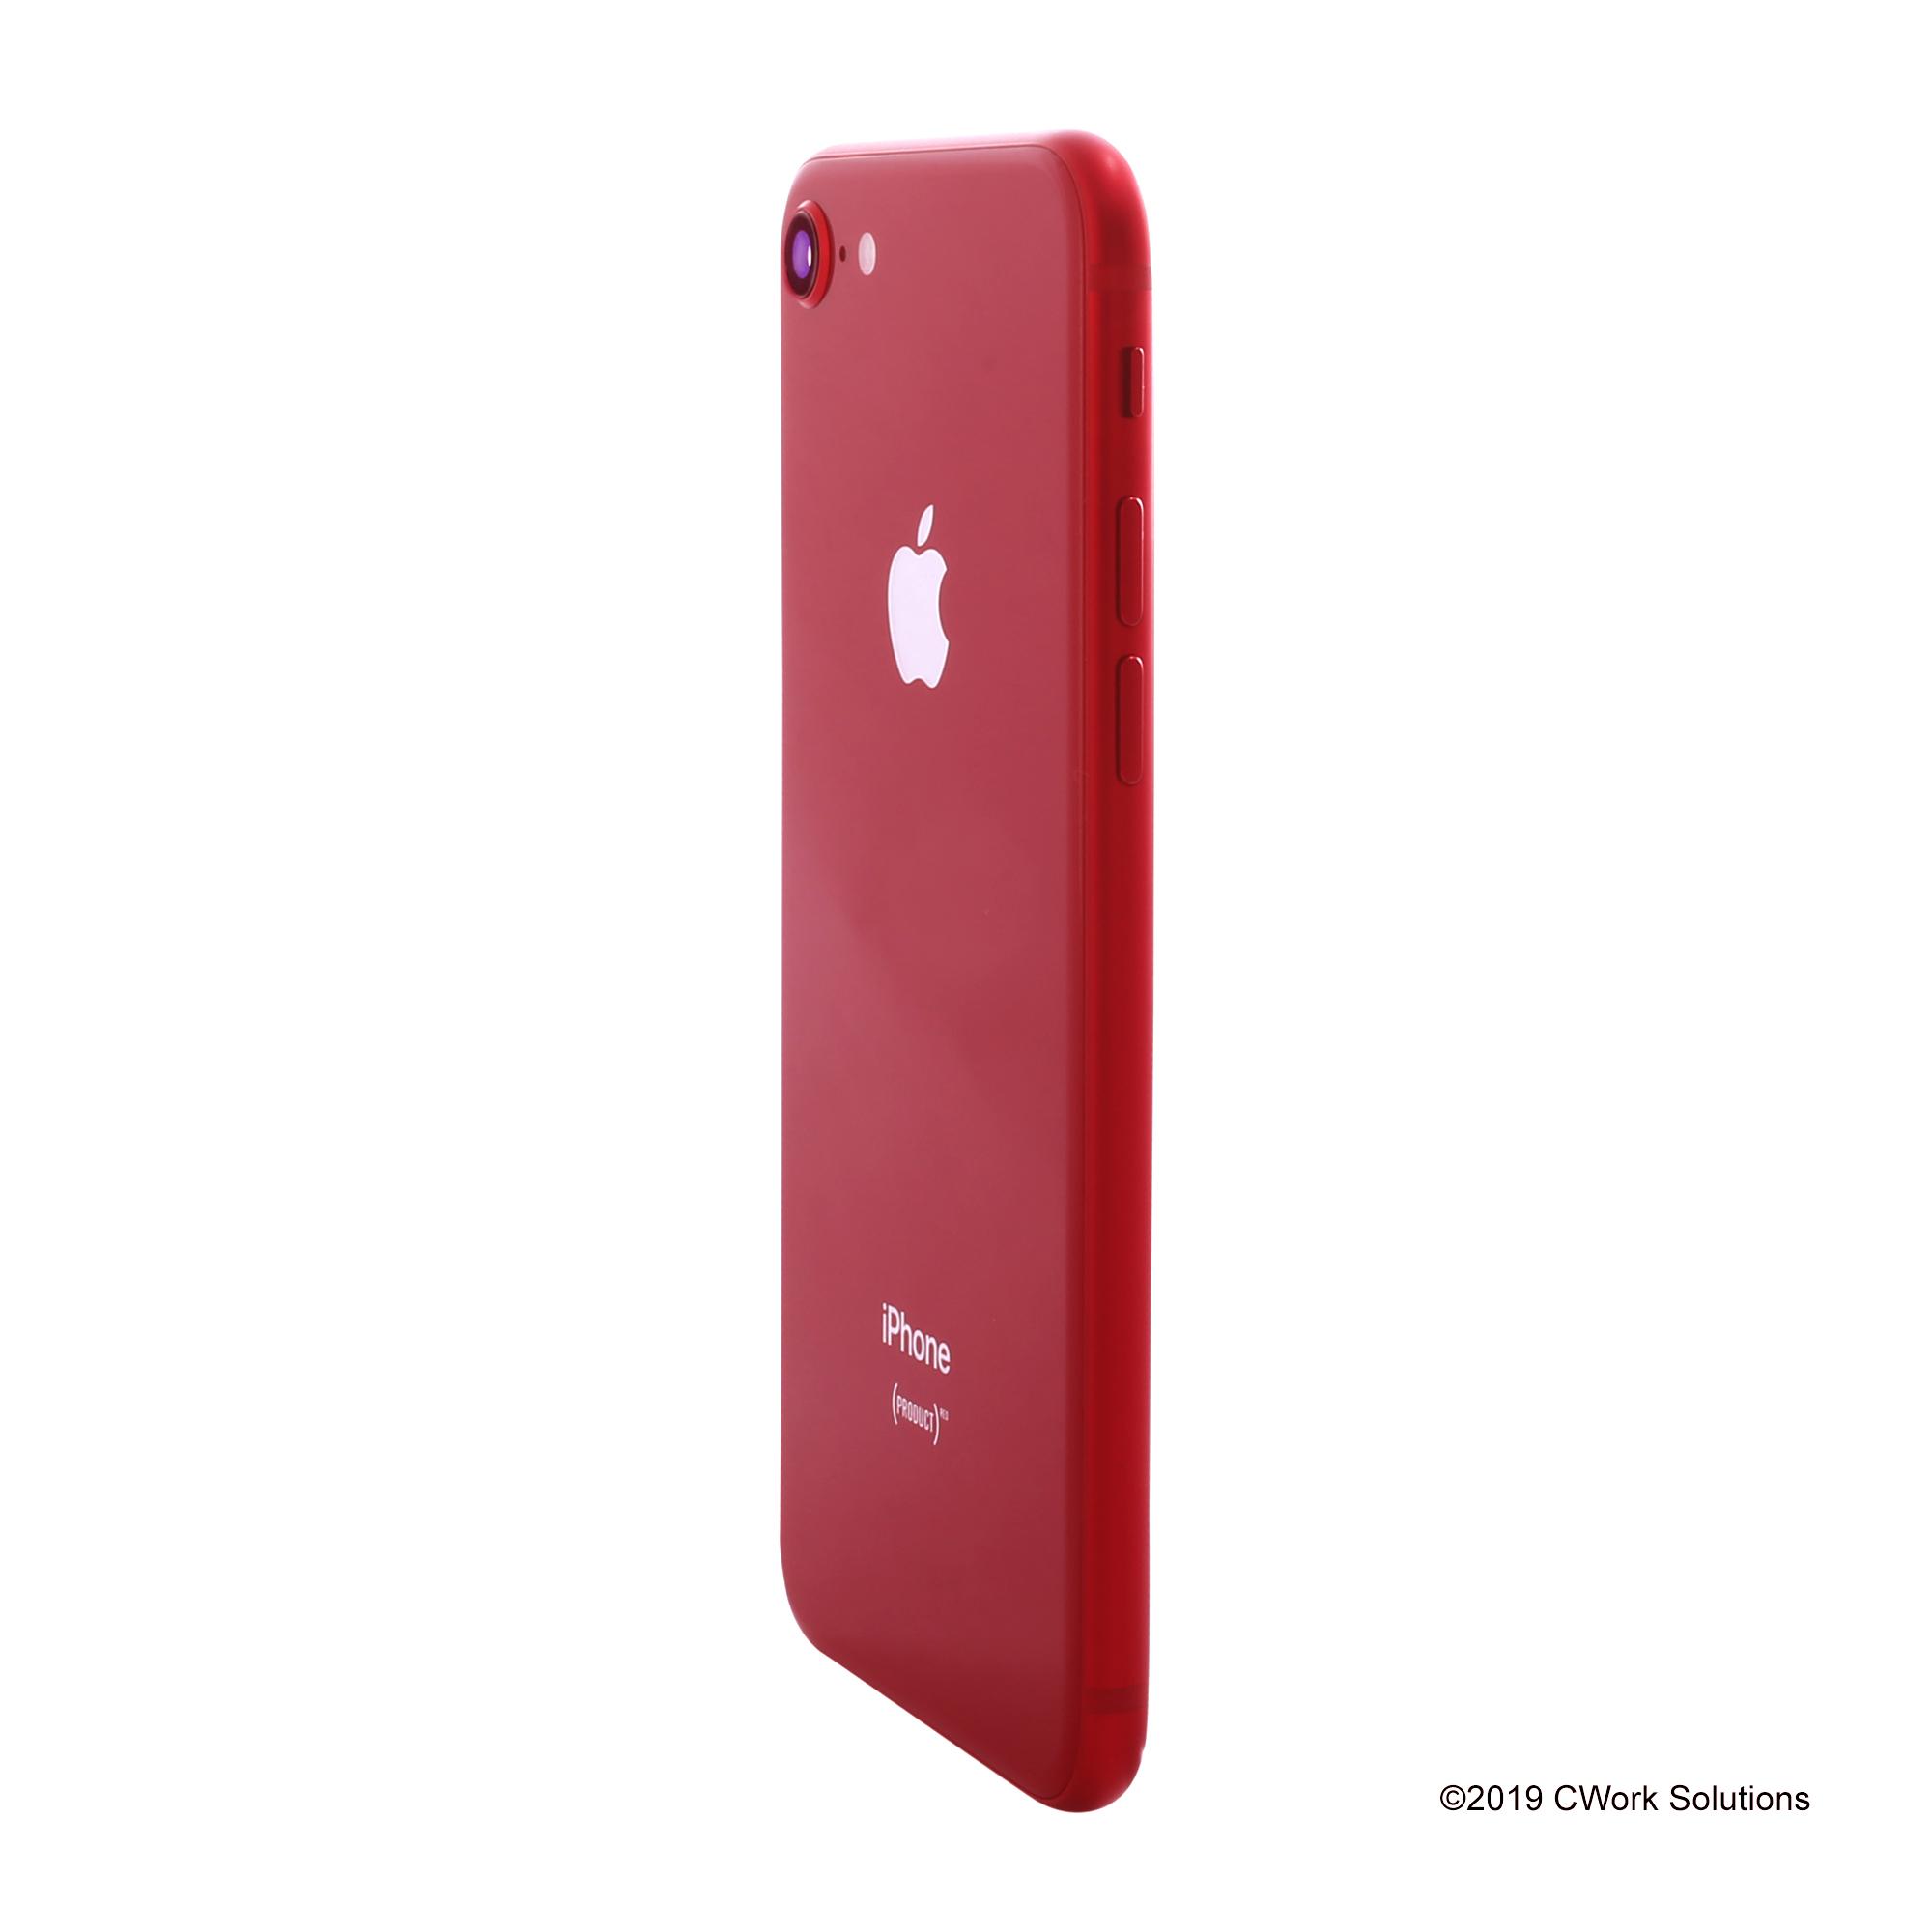 Apple-iPhone-8-a1863-64GB-Verizon-Unlocked-Excellent thumbnail 12